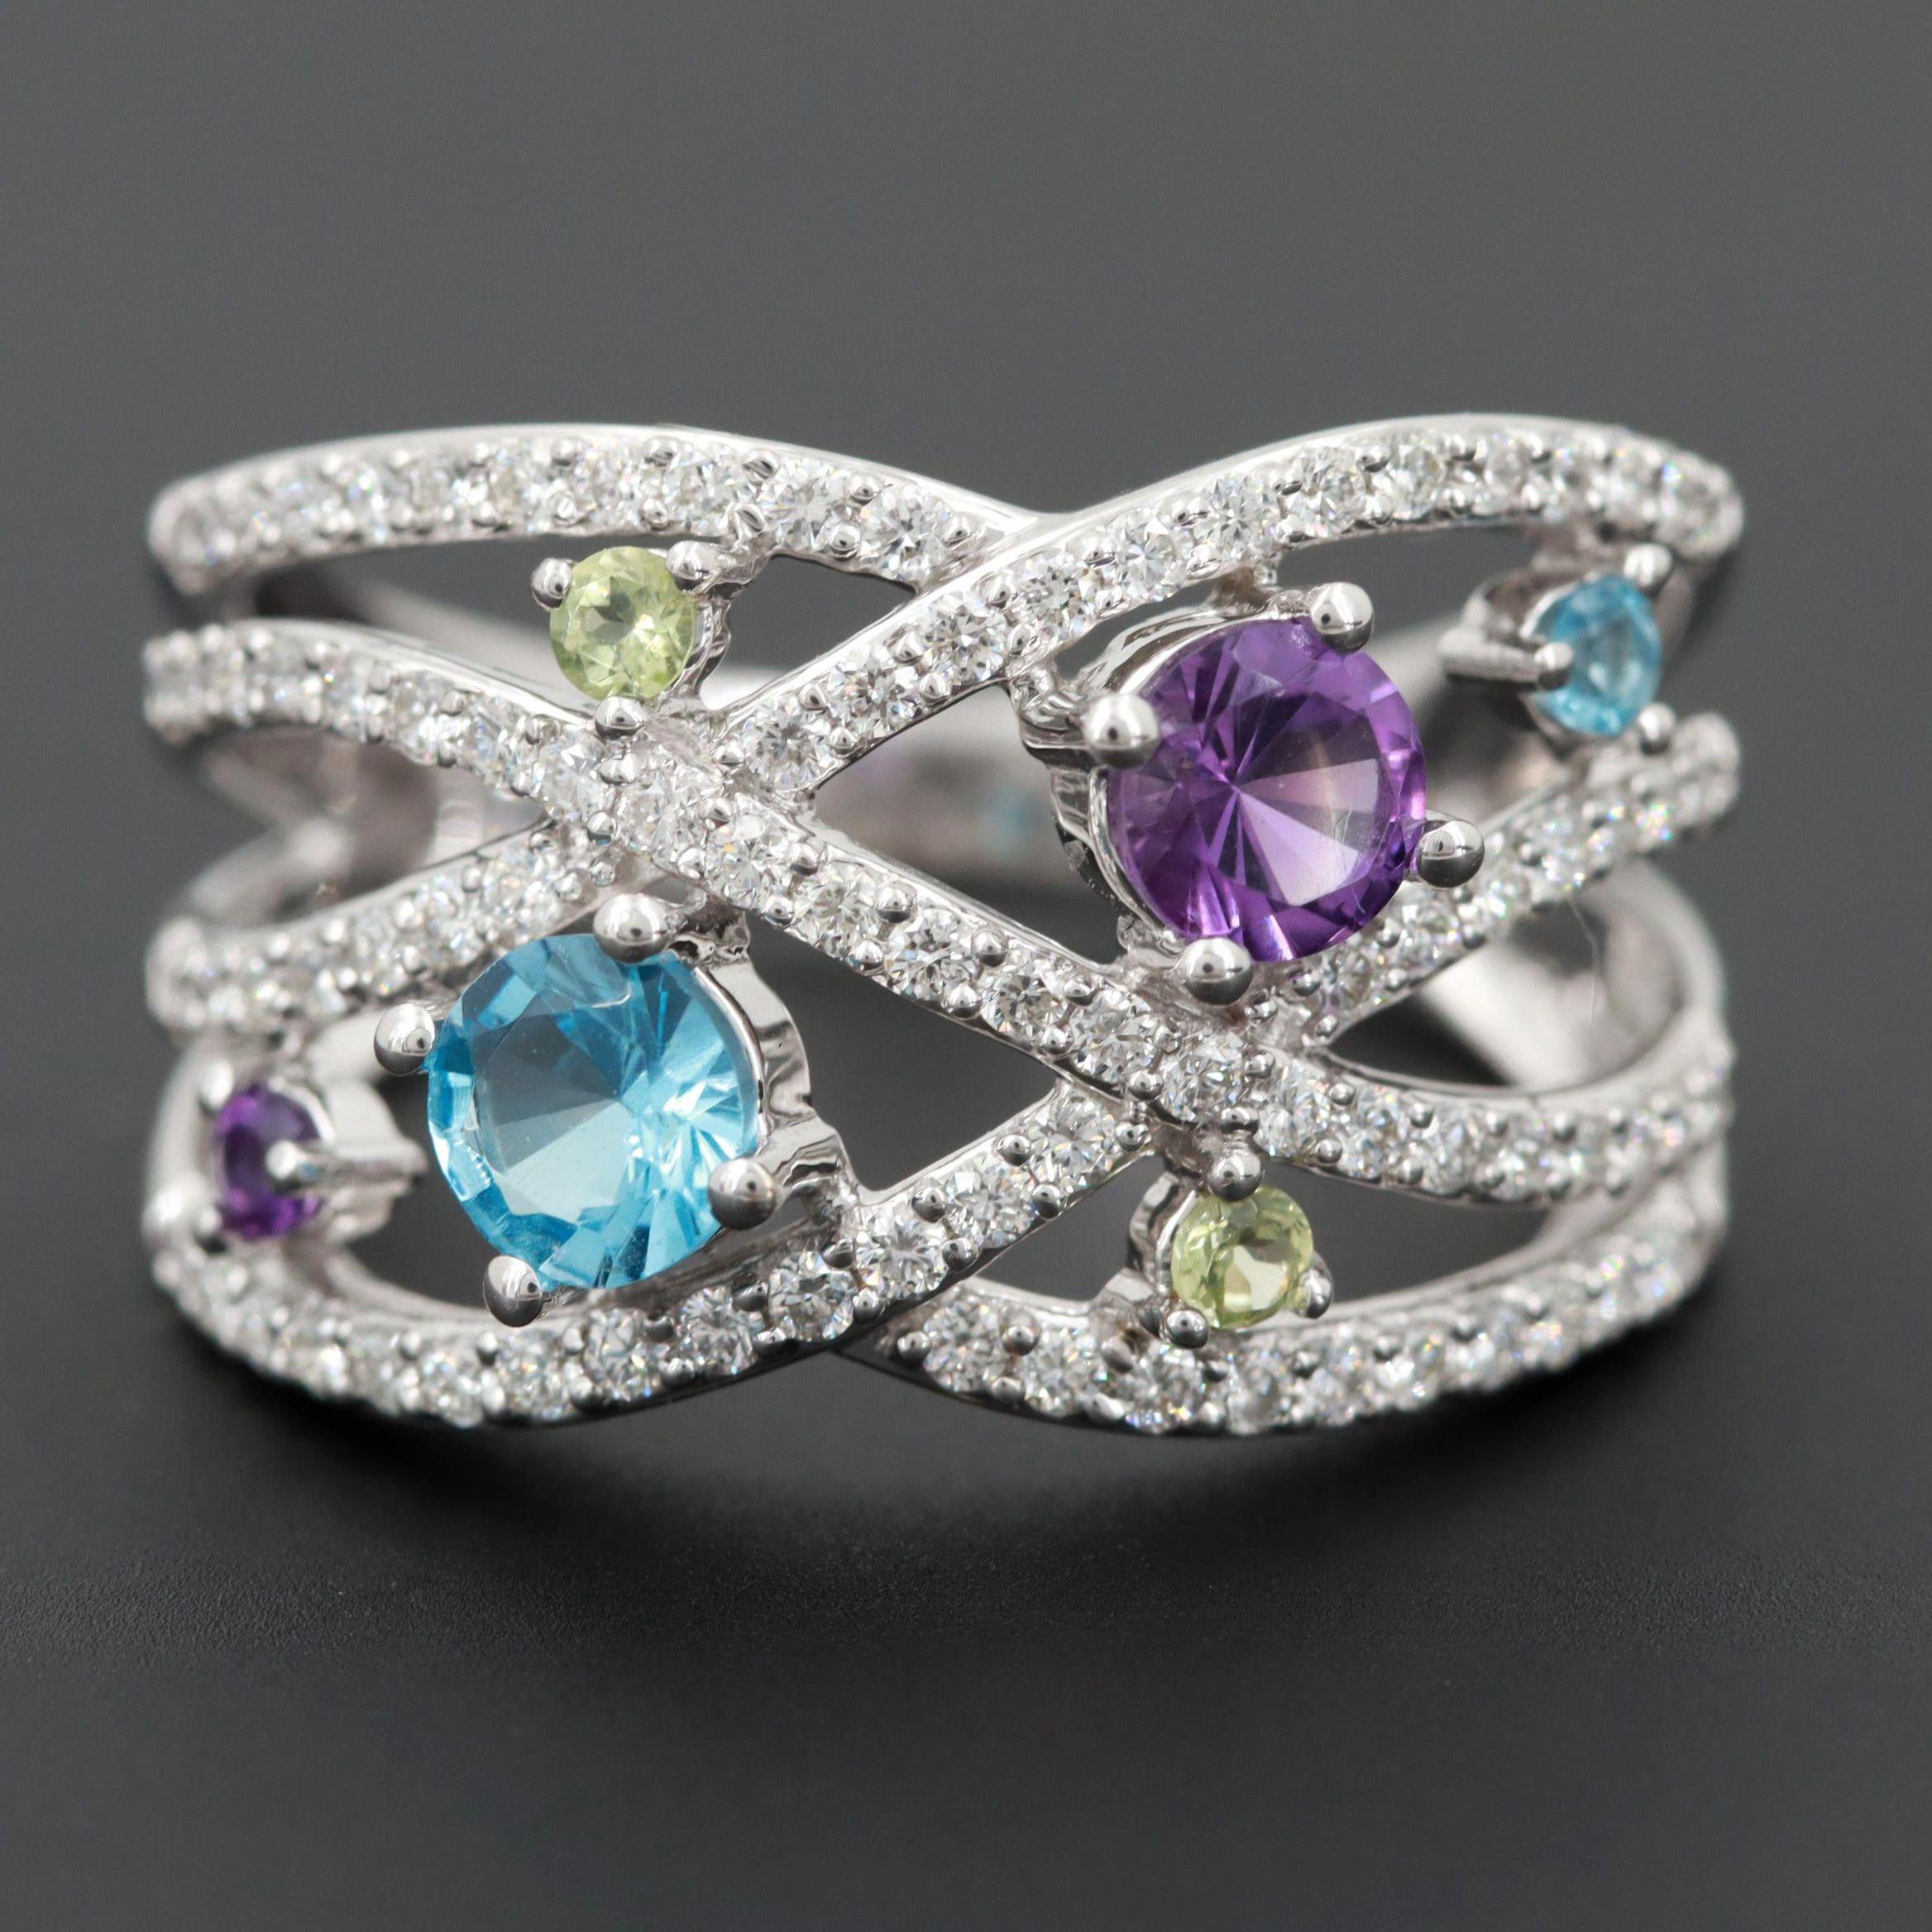 14K White Gold Amethyst, Blue Topaz, Peridot and Diamond Ring